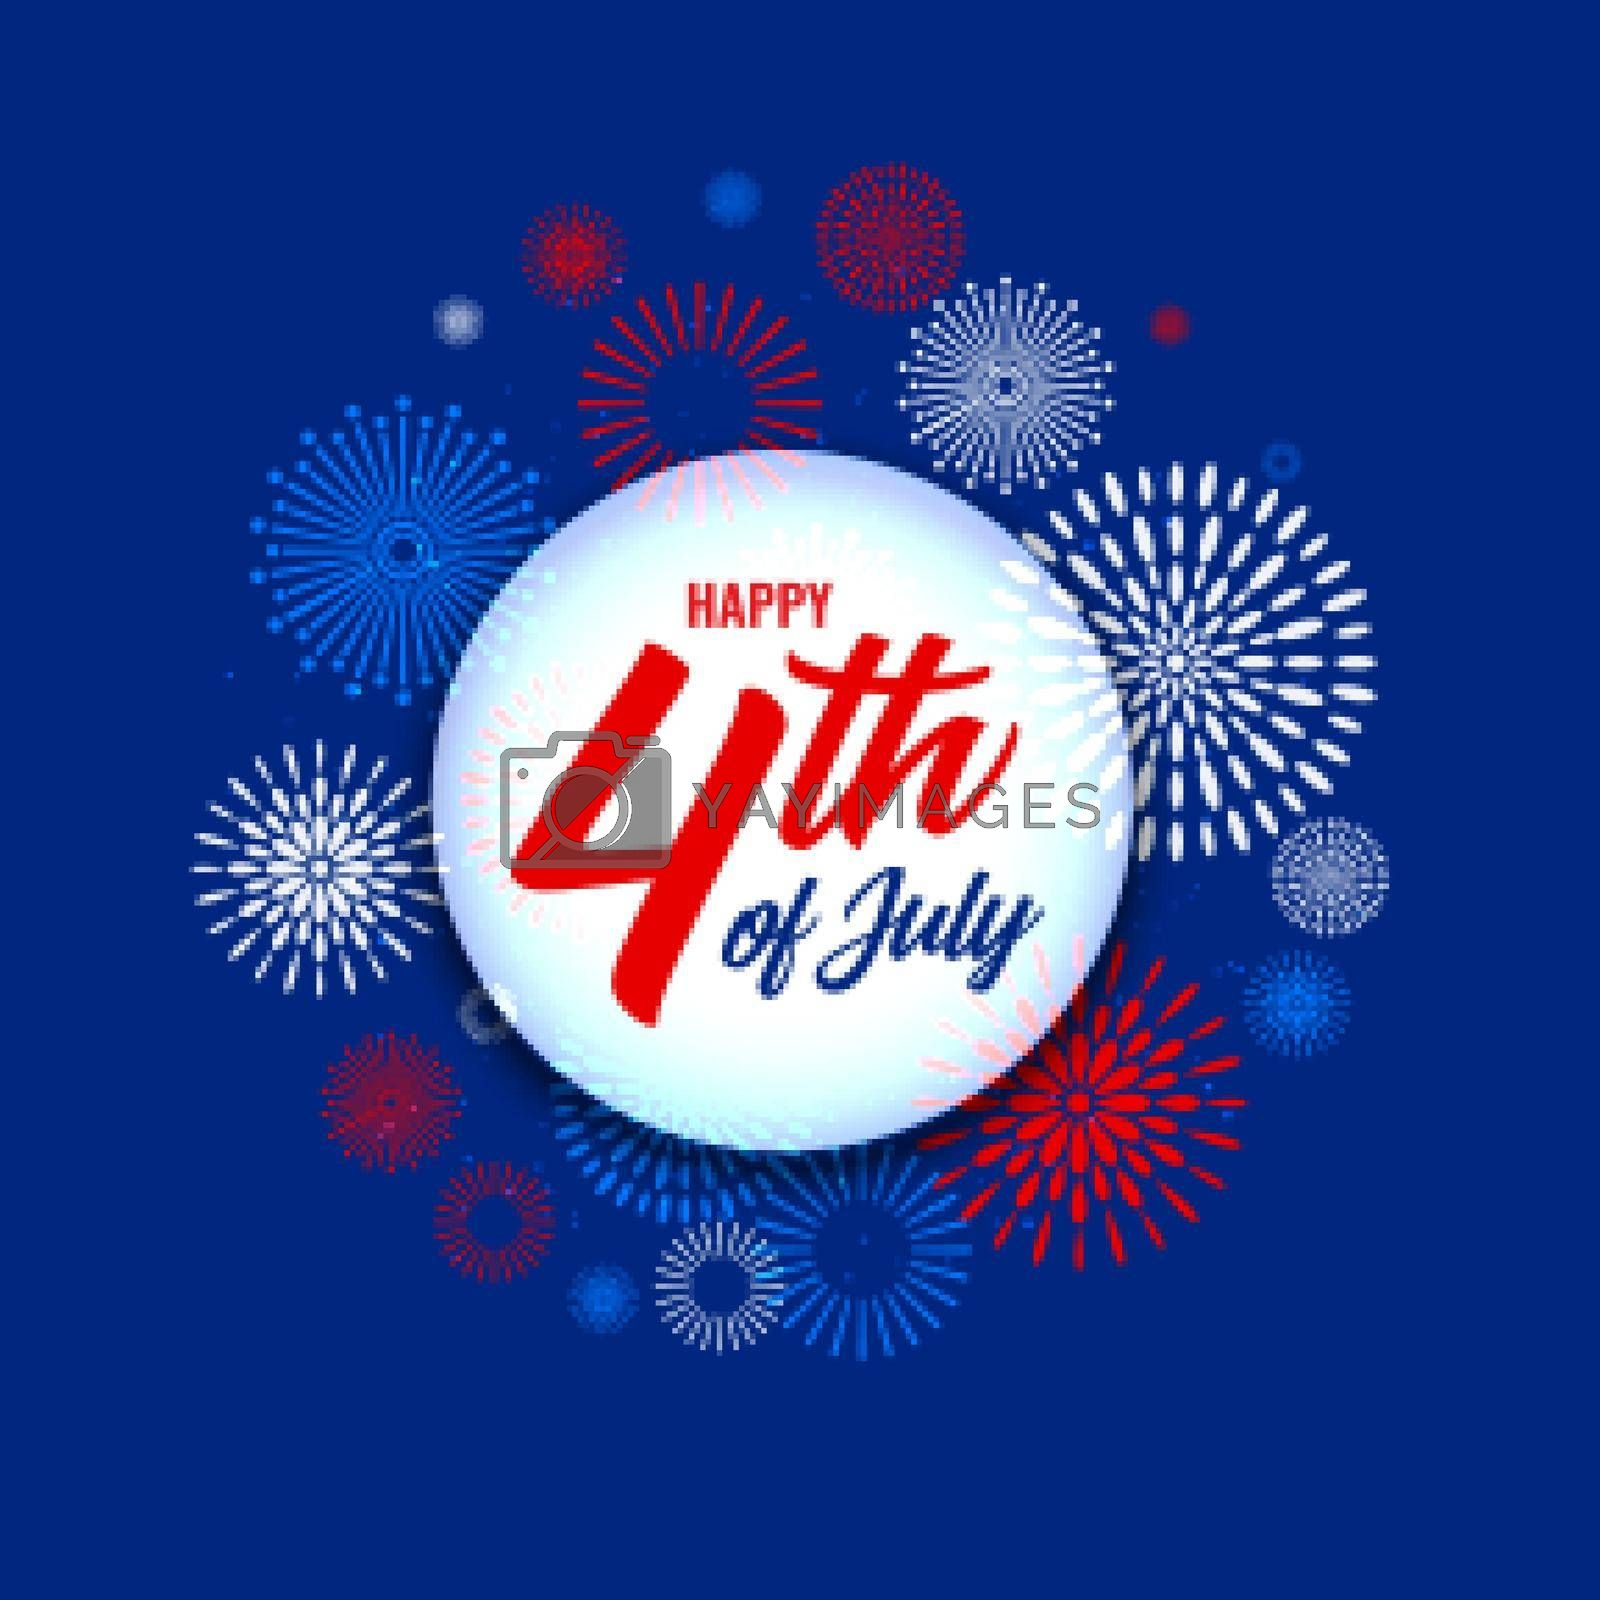 Royalty free image of 4th of july independence day fireworks background by mstjahanara